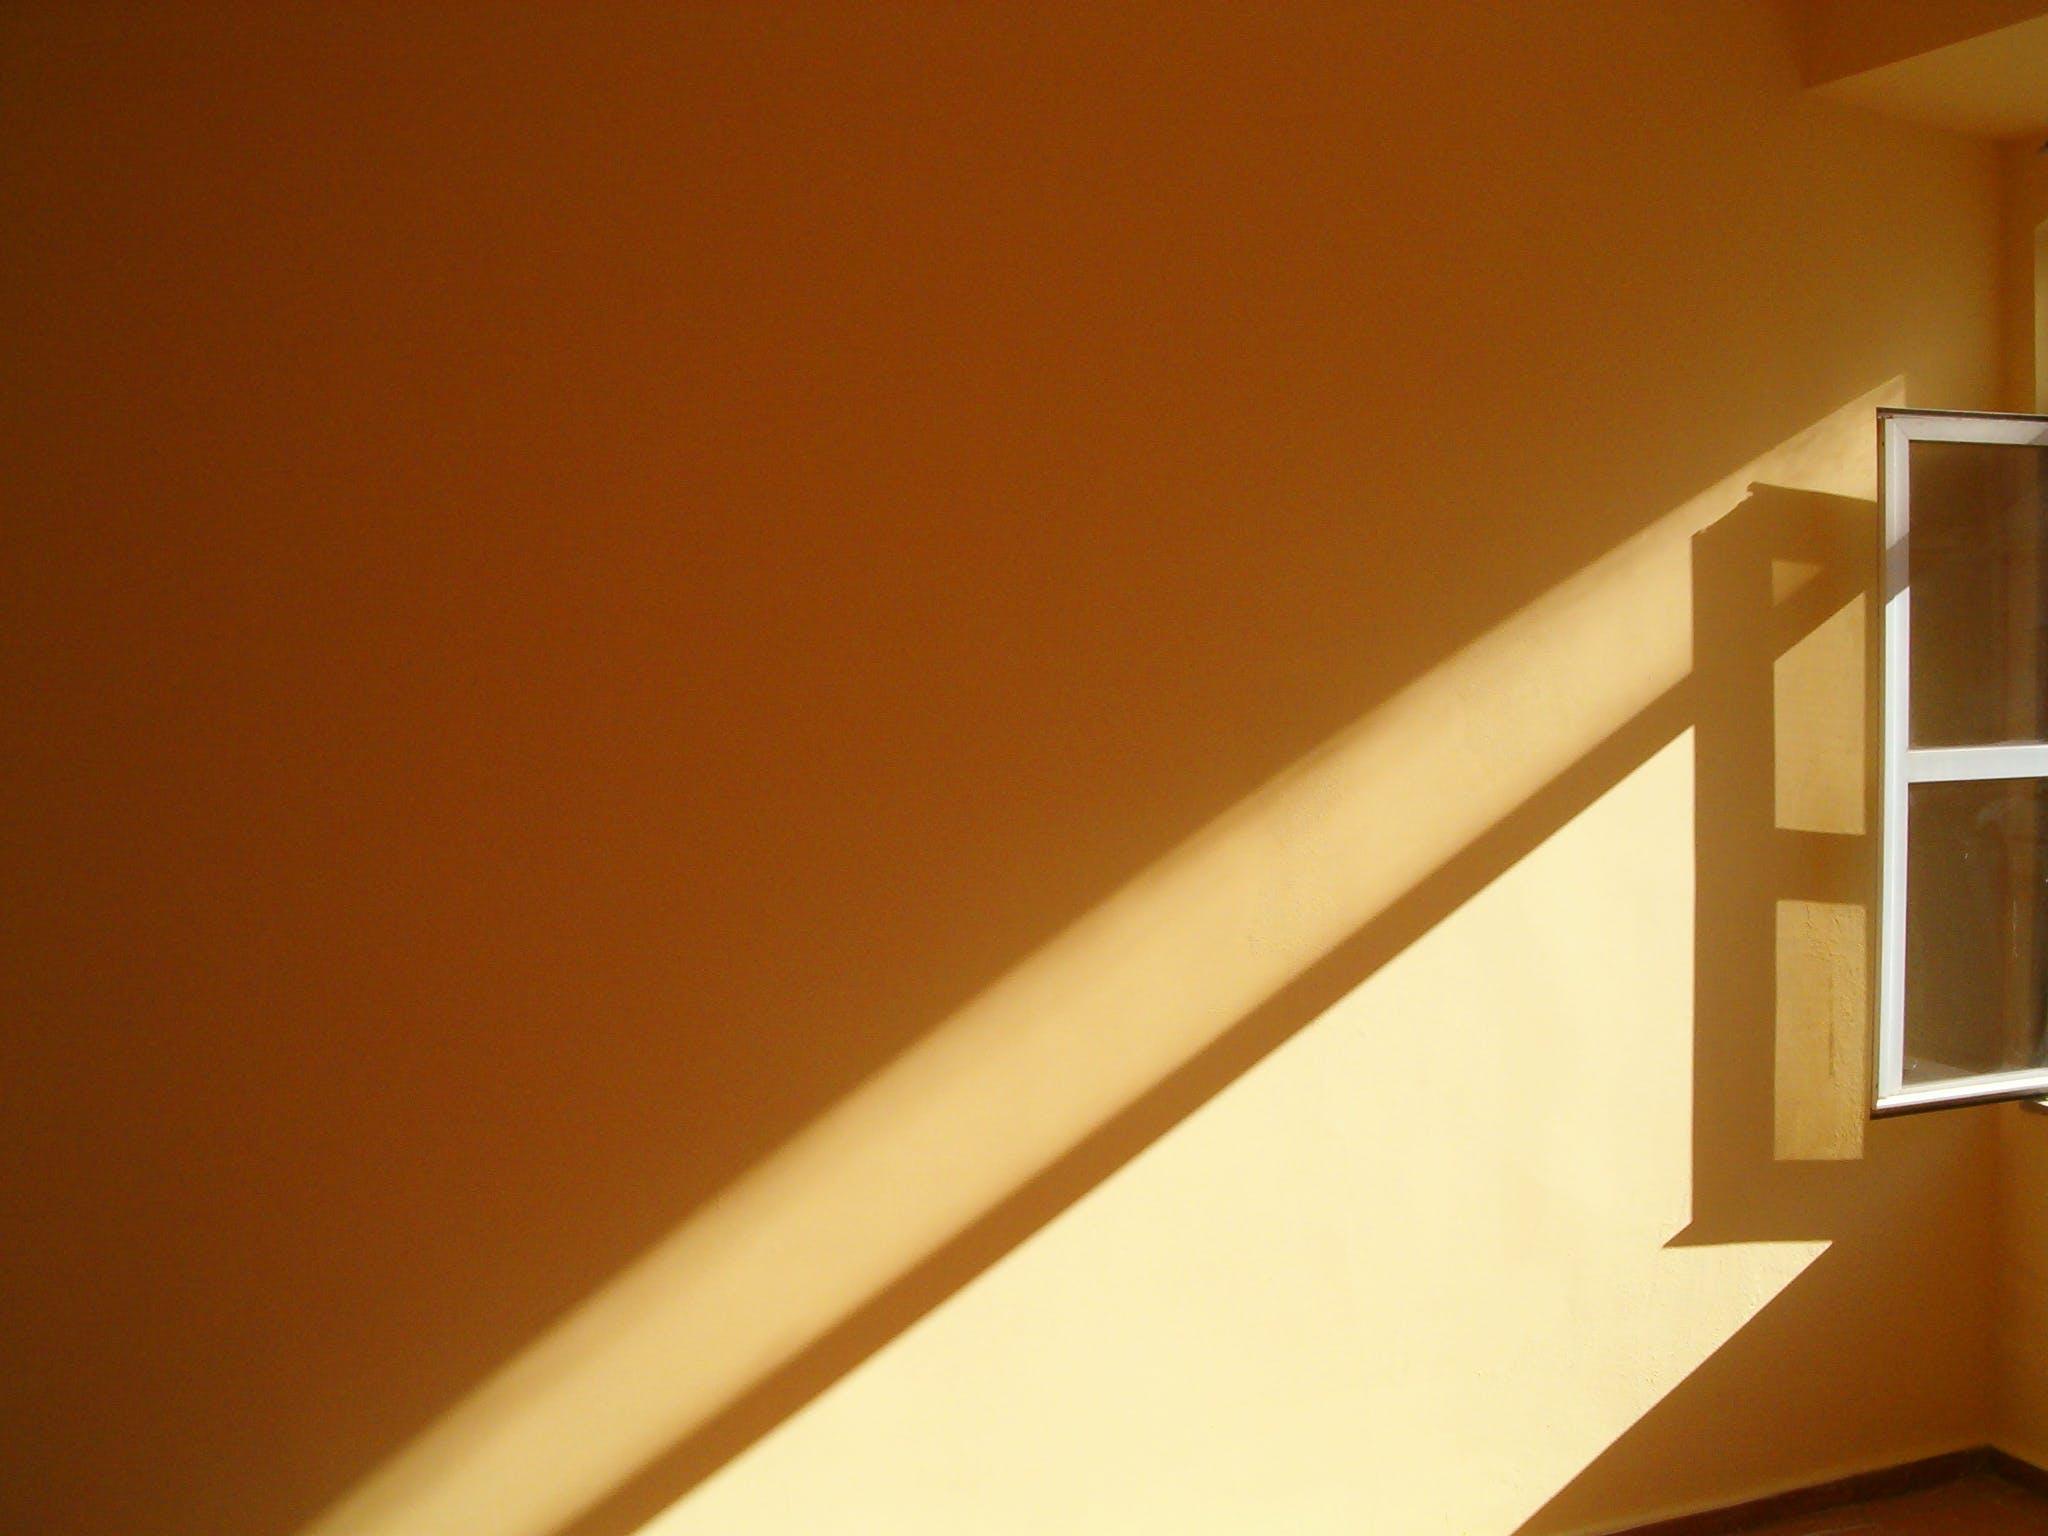 Free stock photo of light, wall, window, room